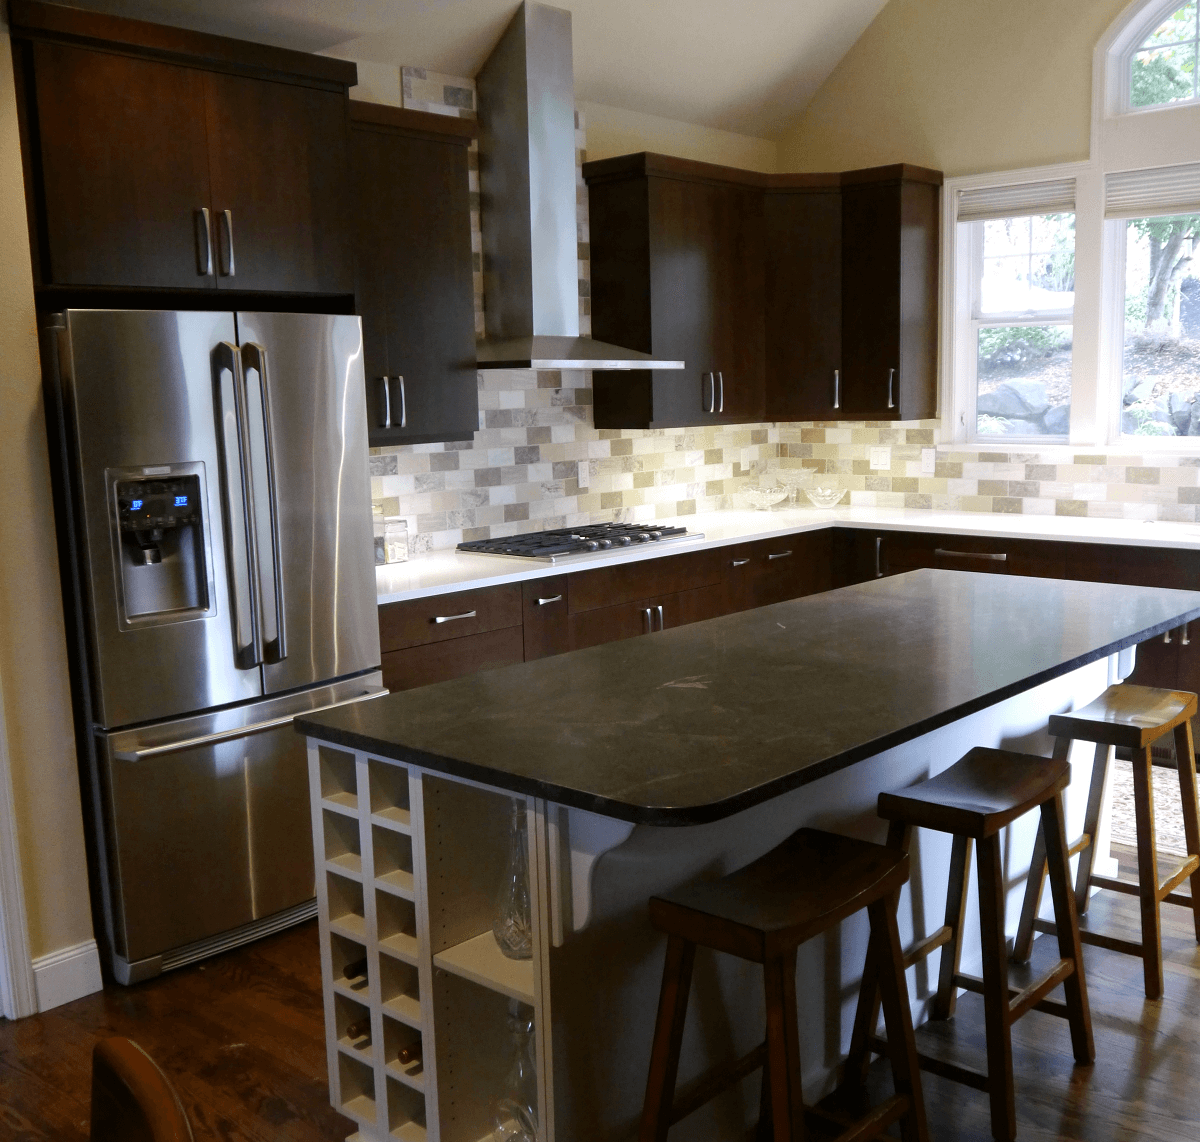 Kitchen Remodel Quartz Countertop: Kitchen Remodeling